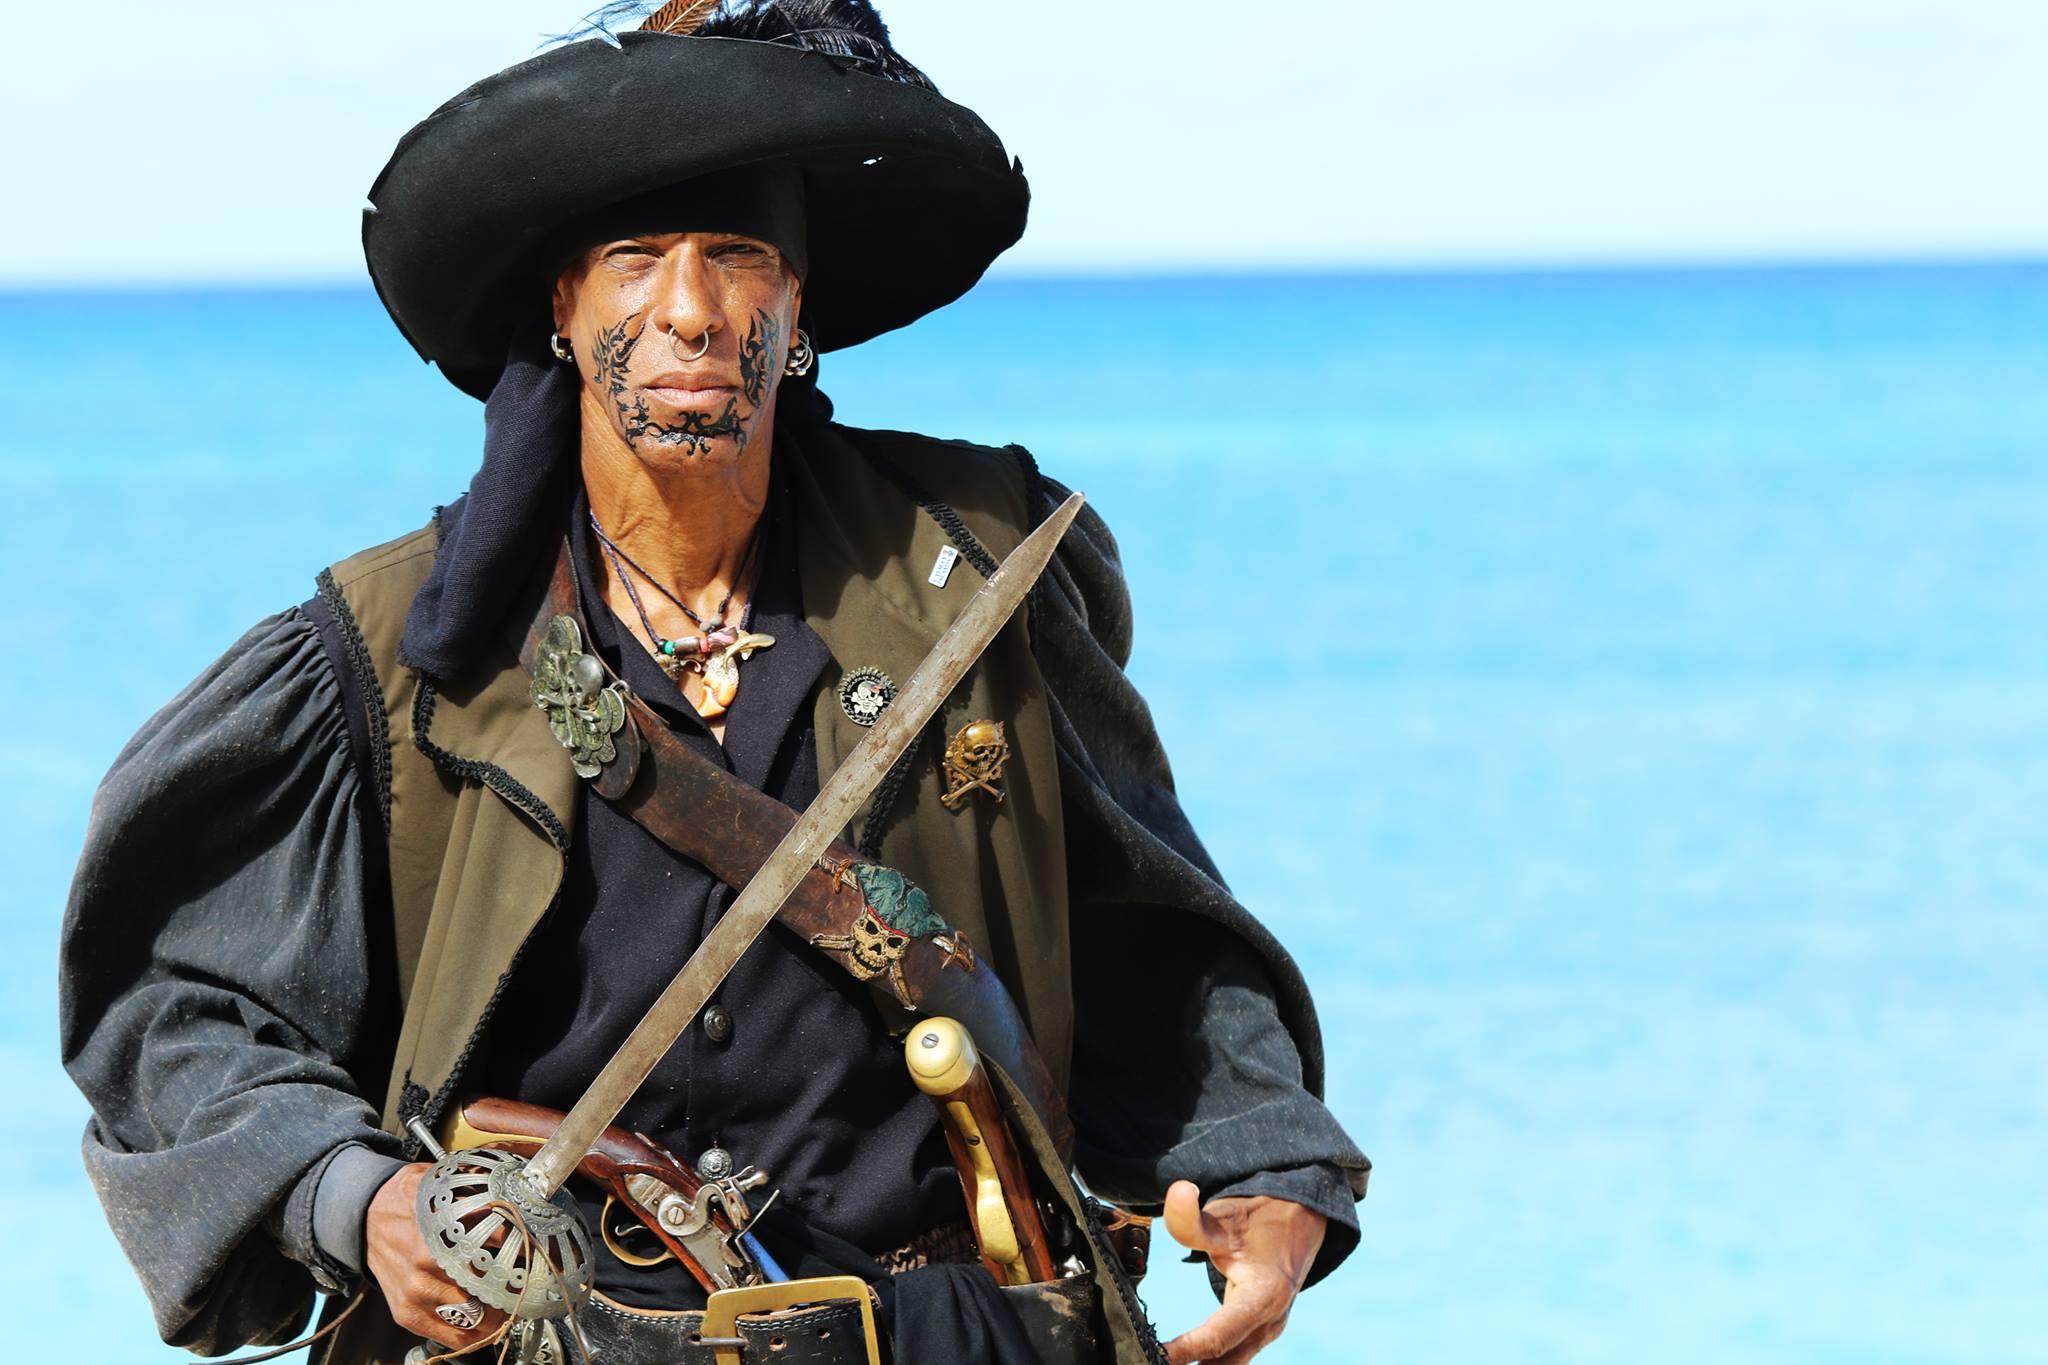 Pirate's Week